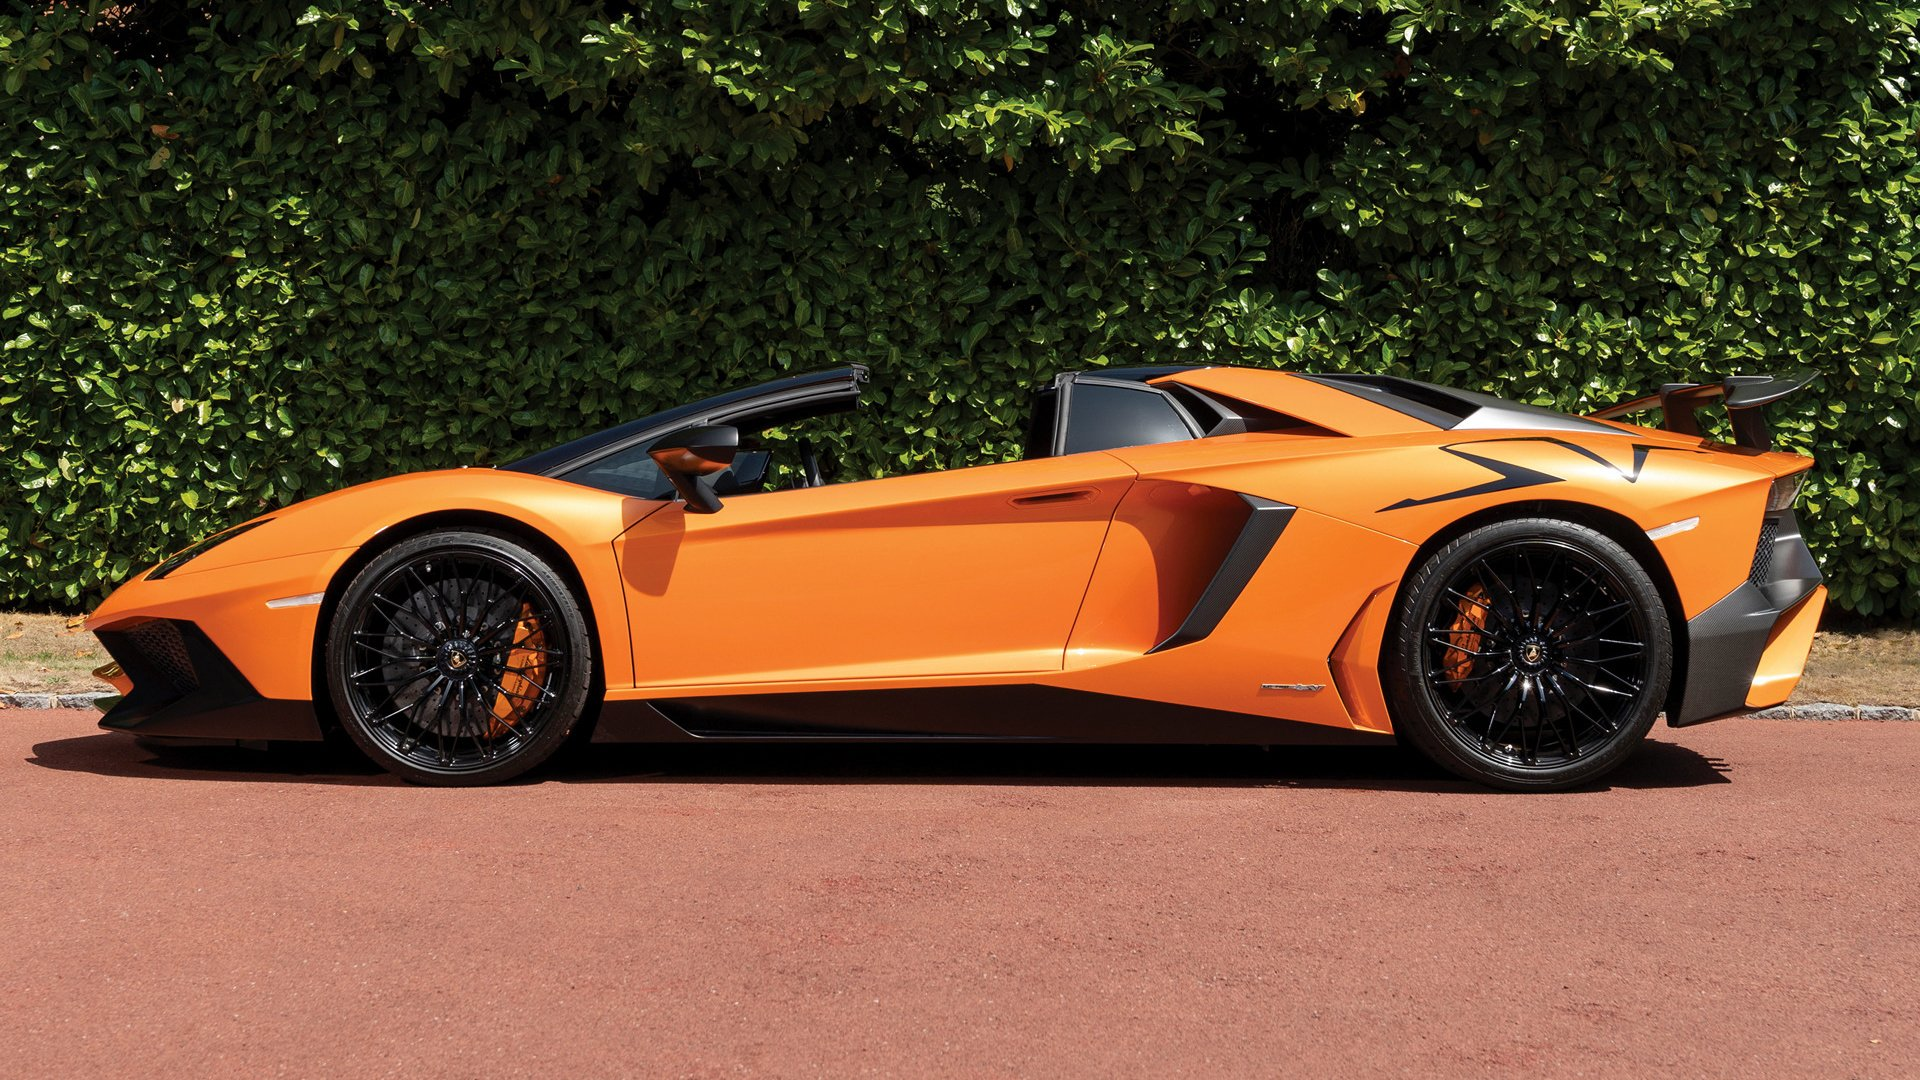 2015 Lamborghini Aventador Lp 750 4 Superveloce Roadster Hd